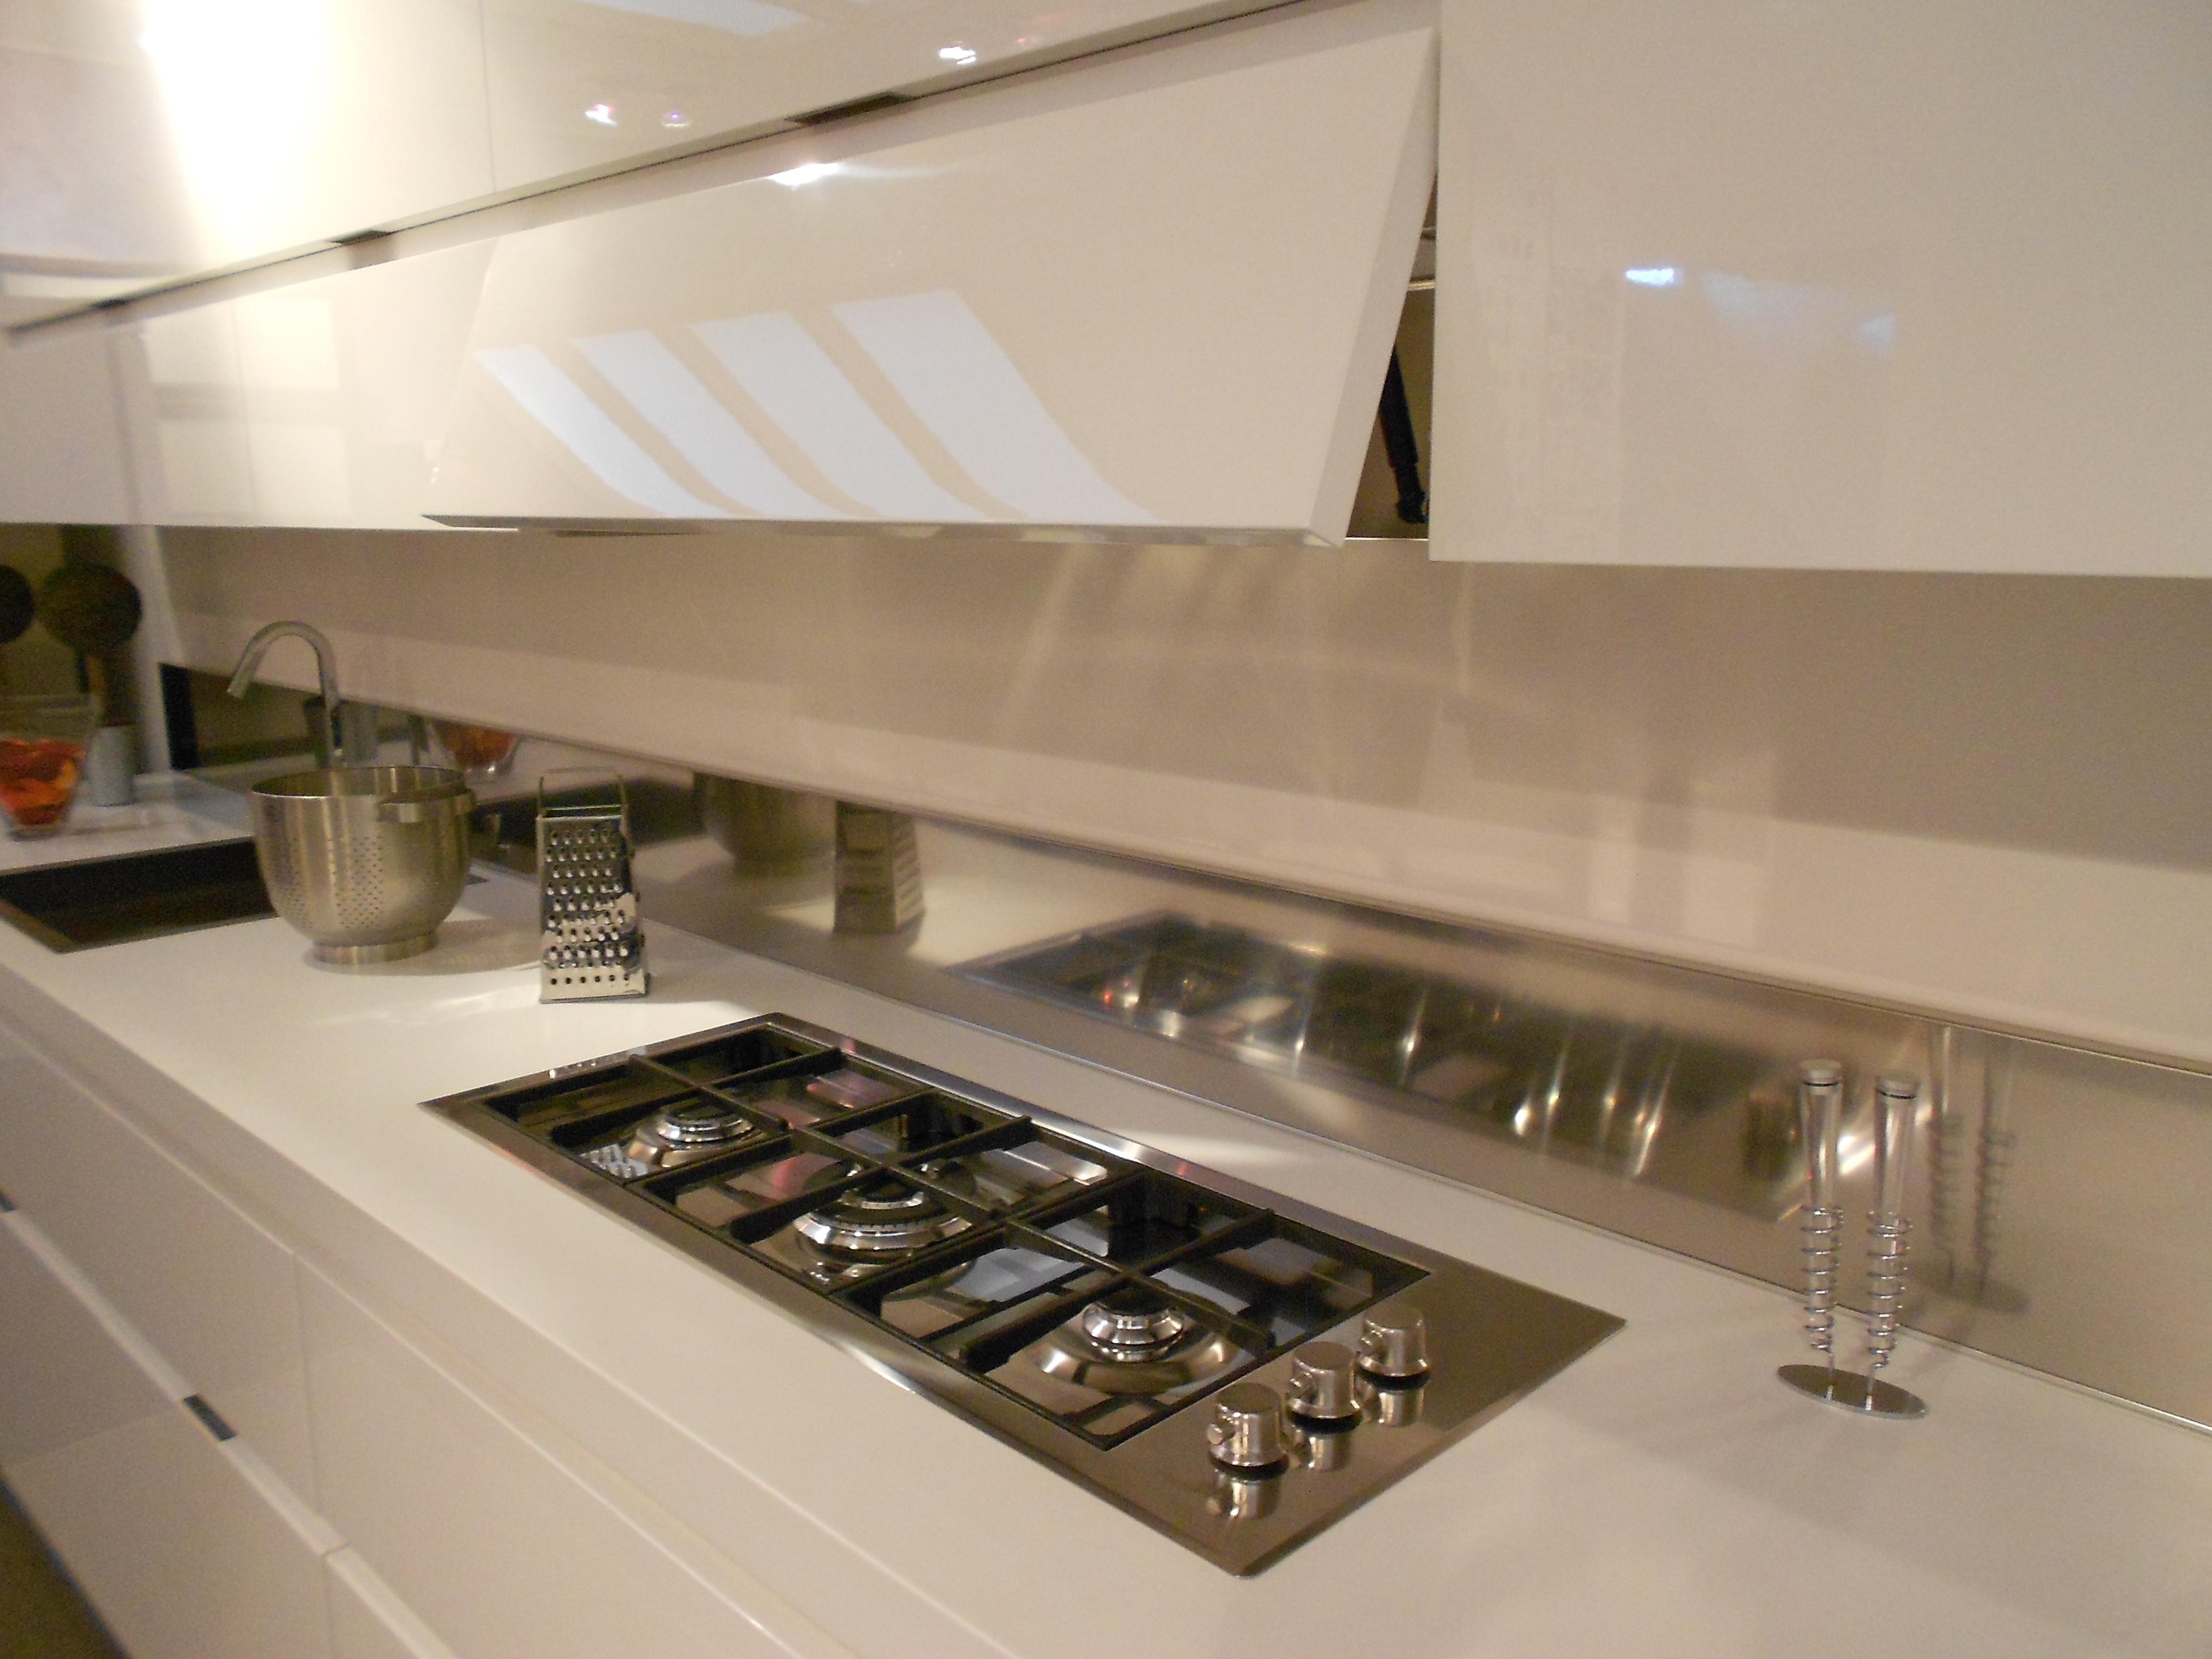 Cucina elektra scontata cucine a prezzi scontati for Piano cottura cucina